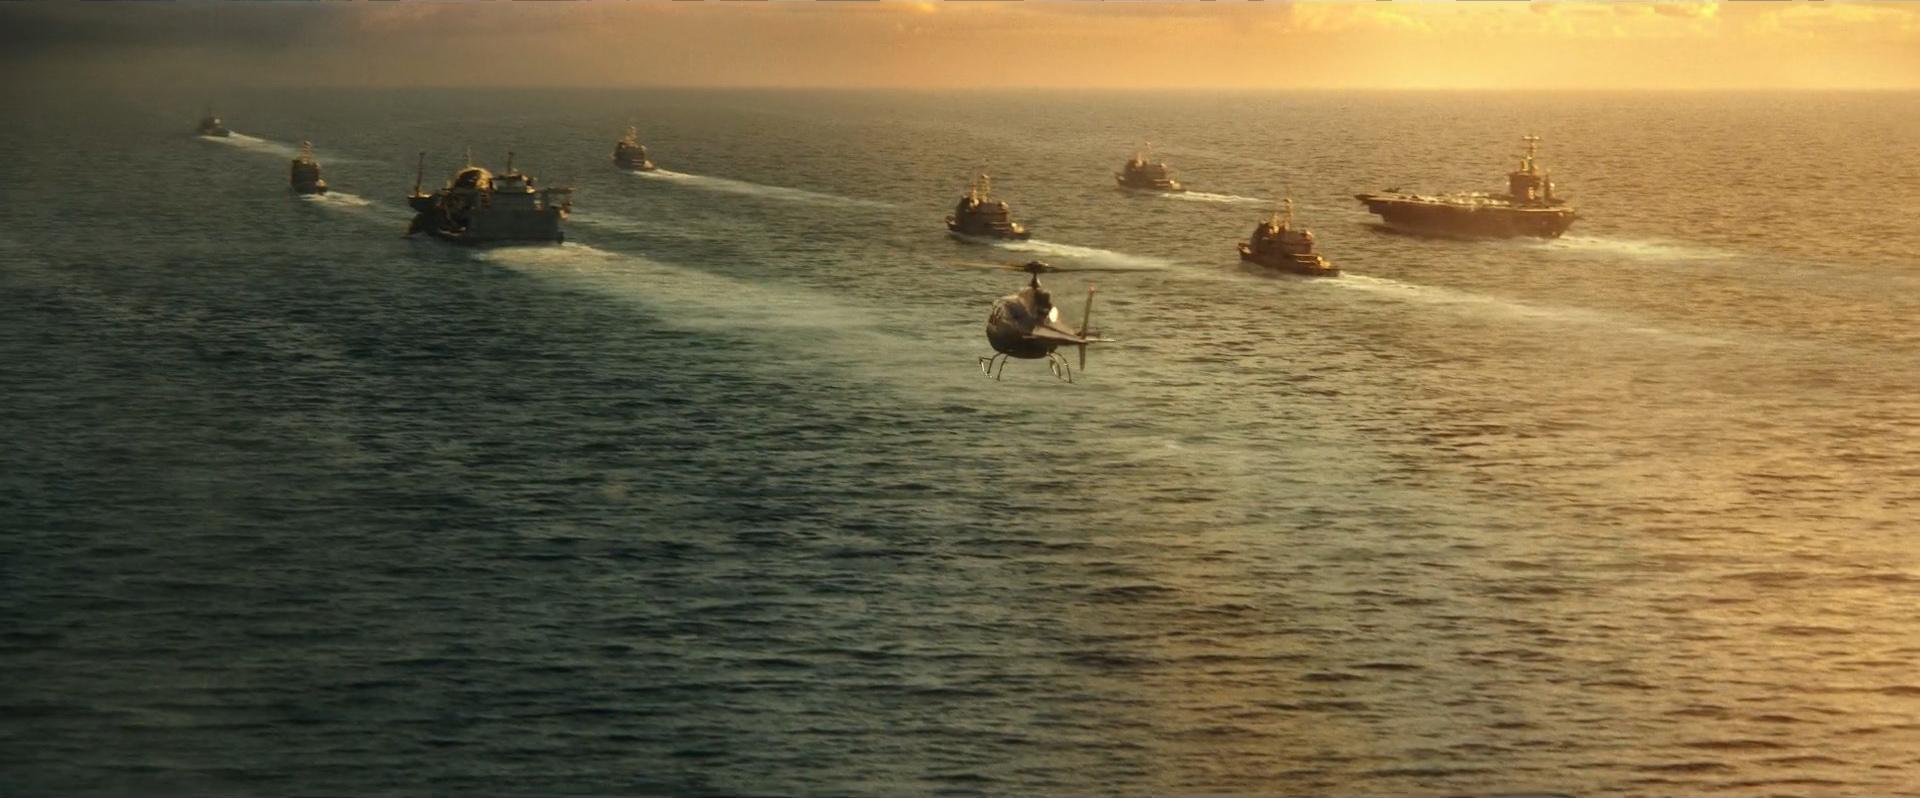 Godzilla vs Kong Trailer Still 03 - Epic Landscape